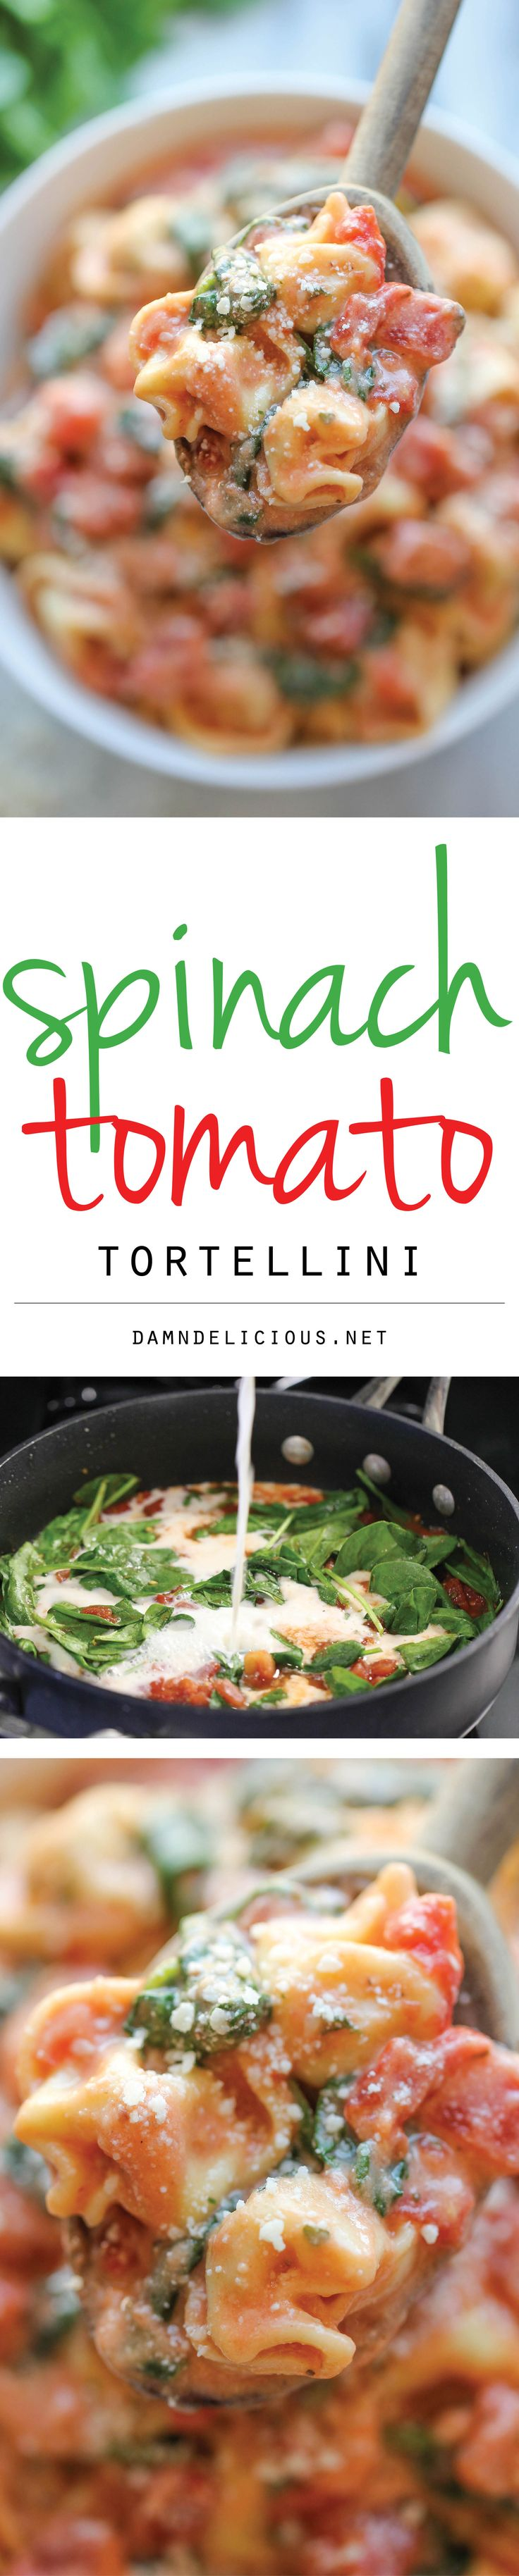 Easy tortellini crock pot recipe